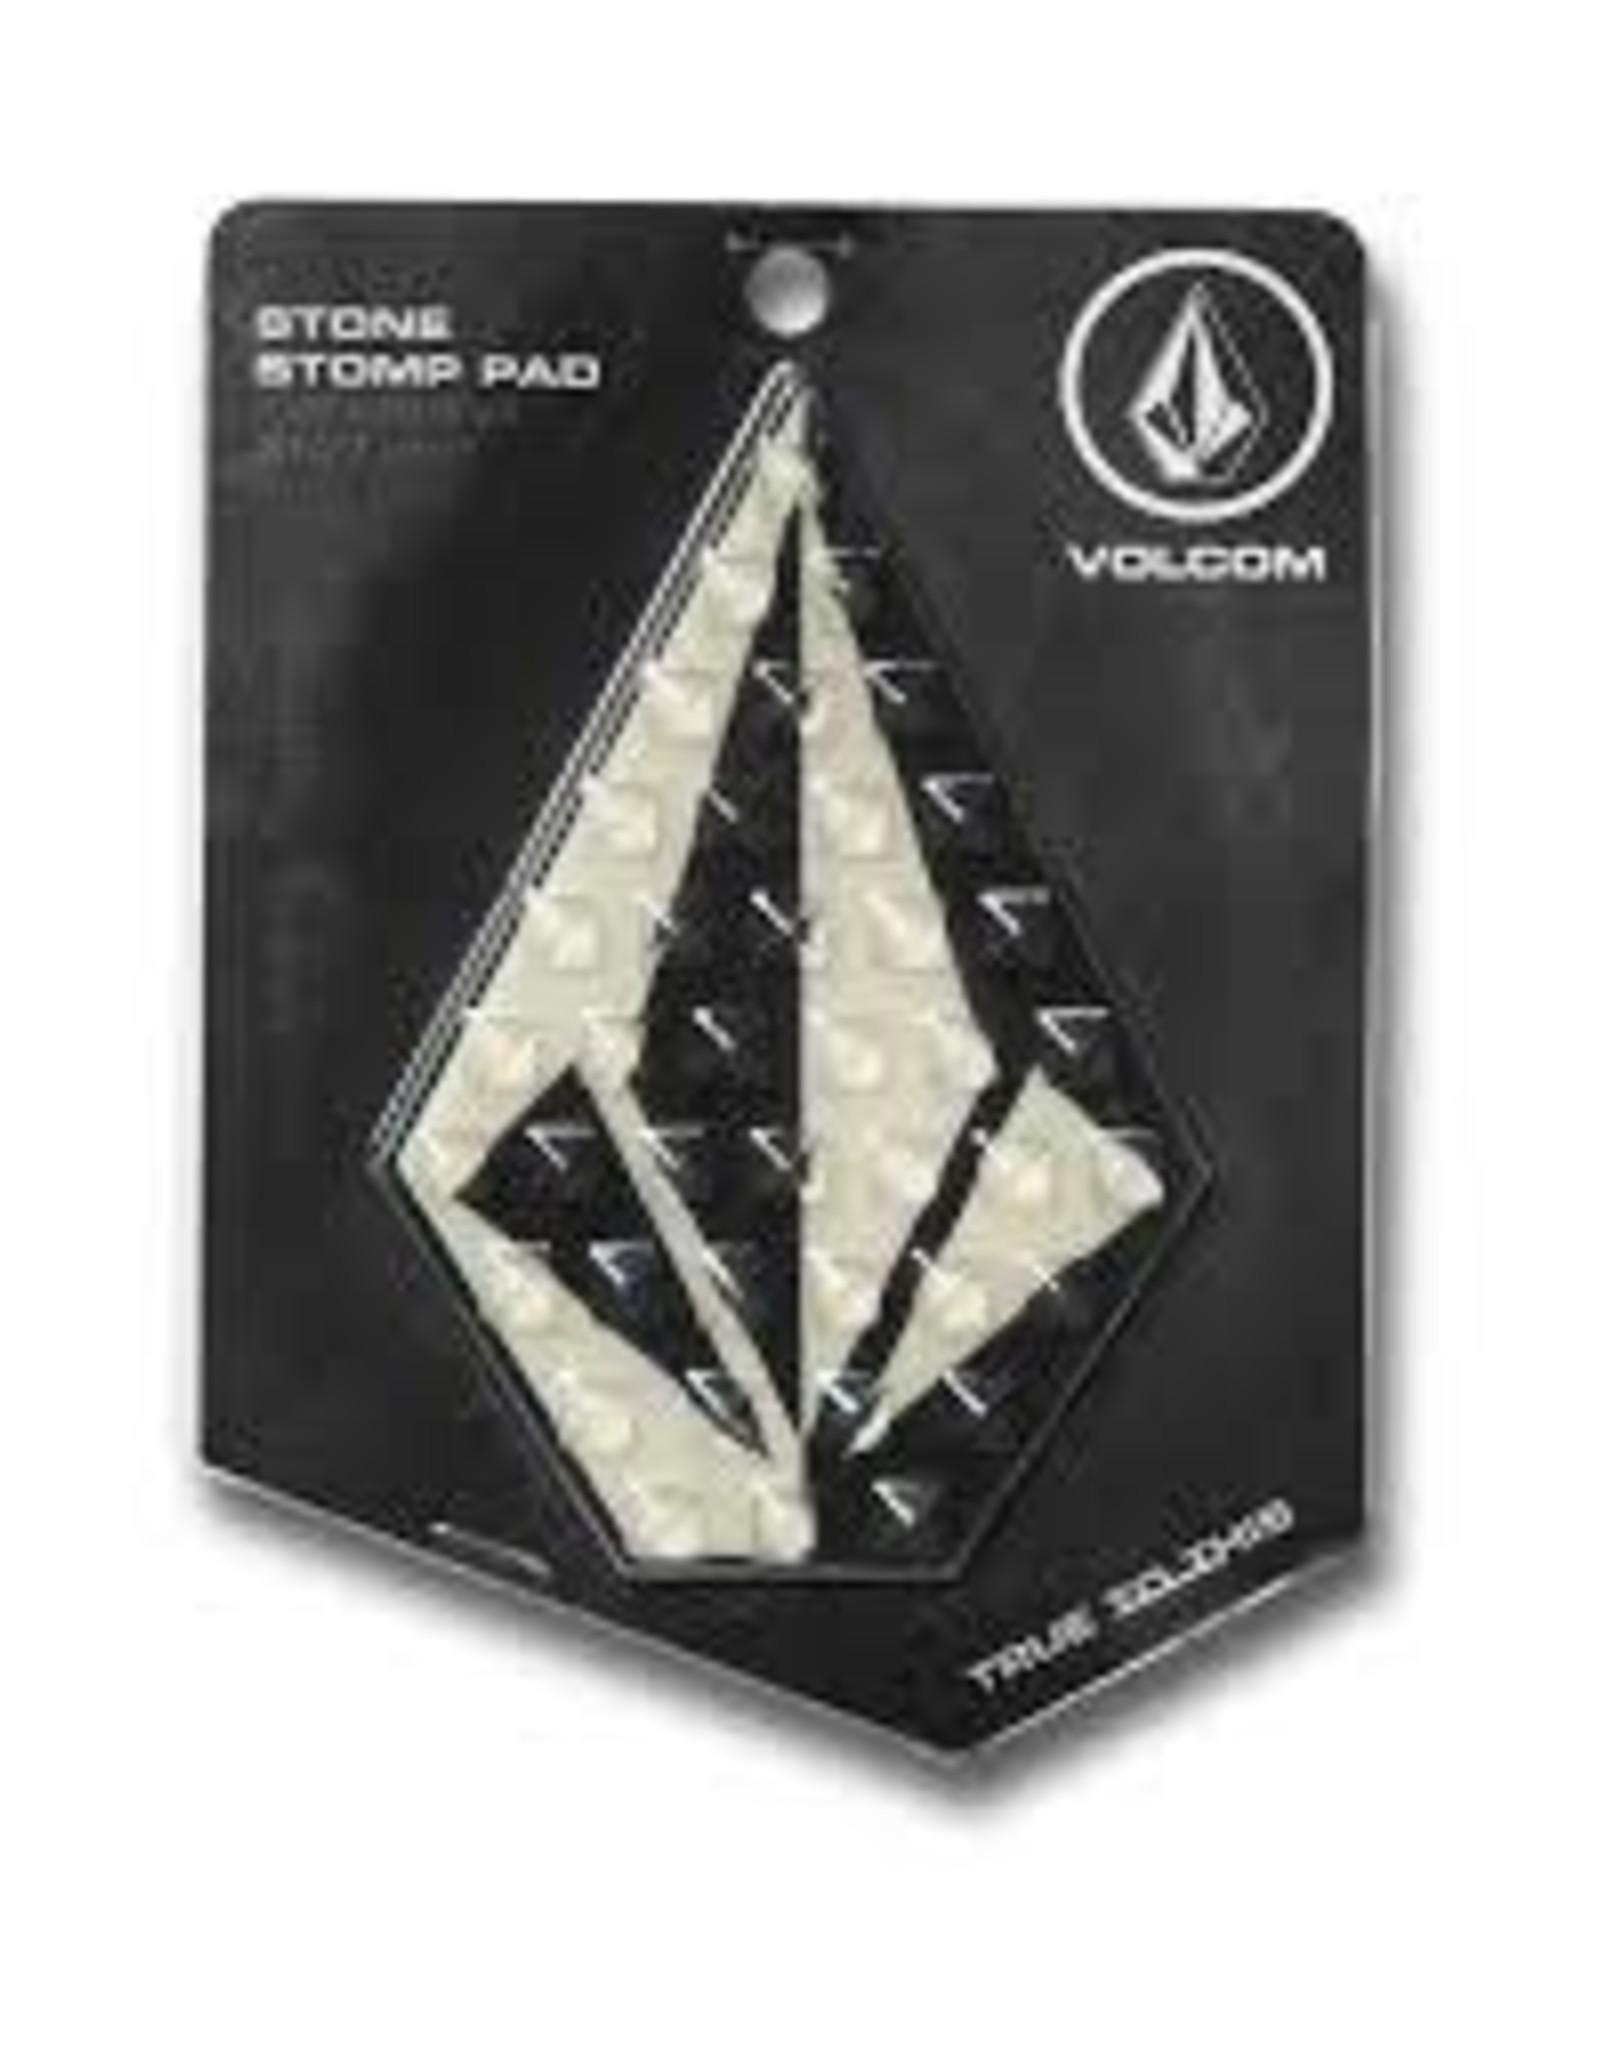 volcom Volcom - Antidérapant stone stomp black